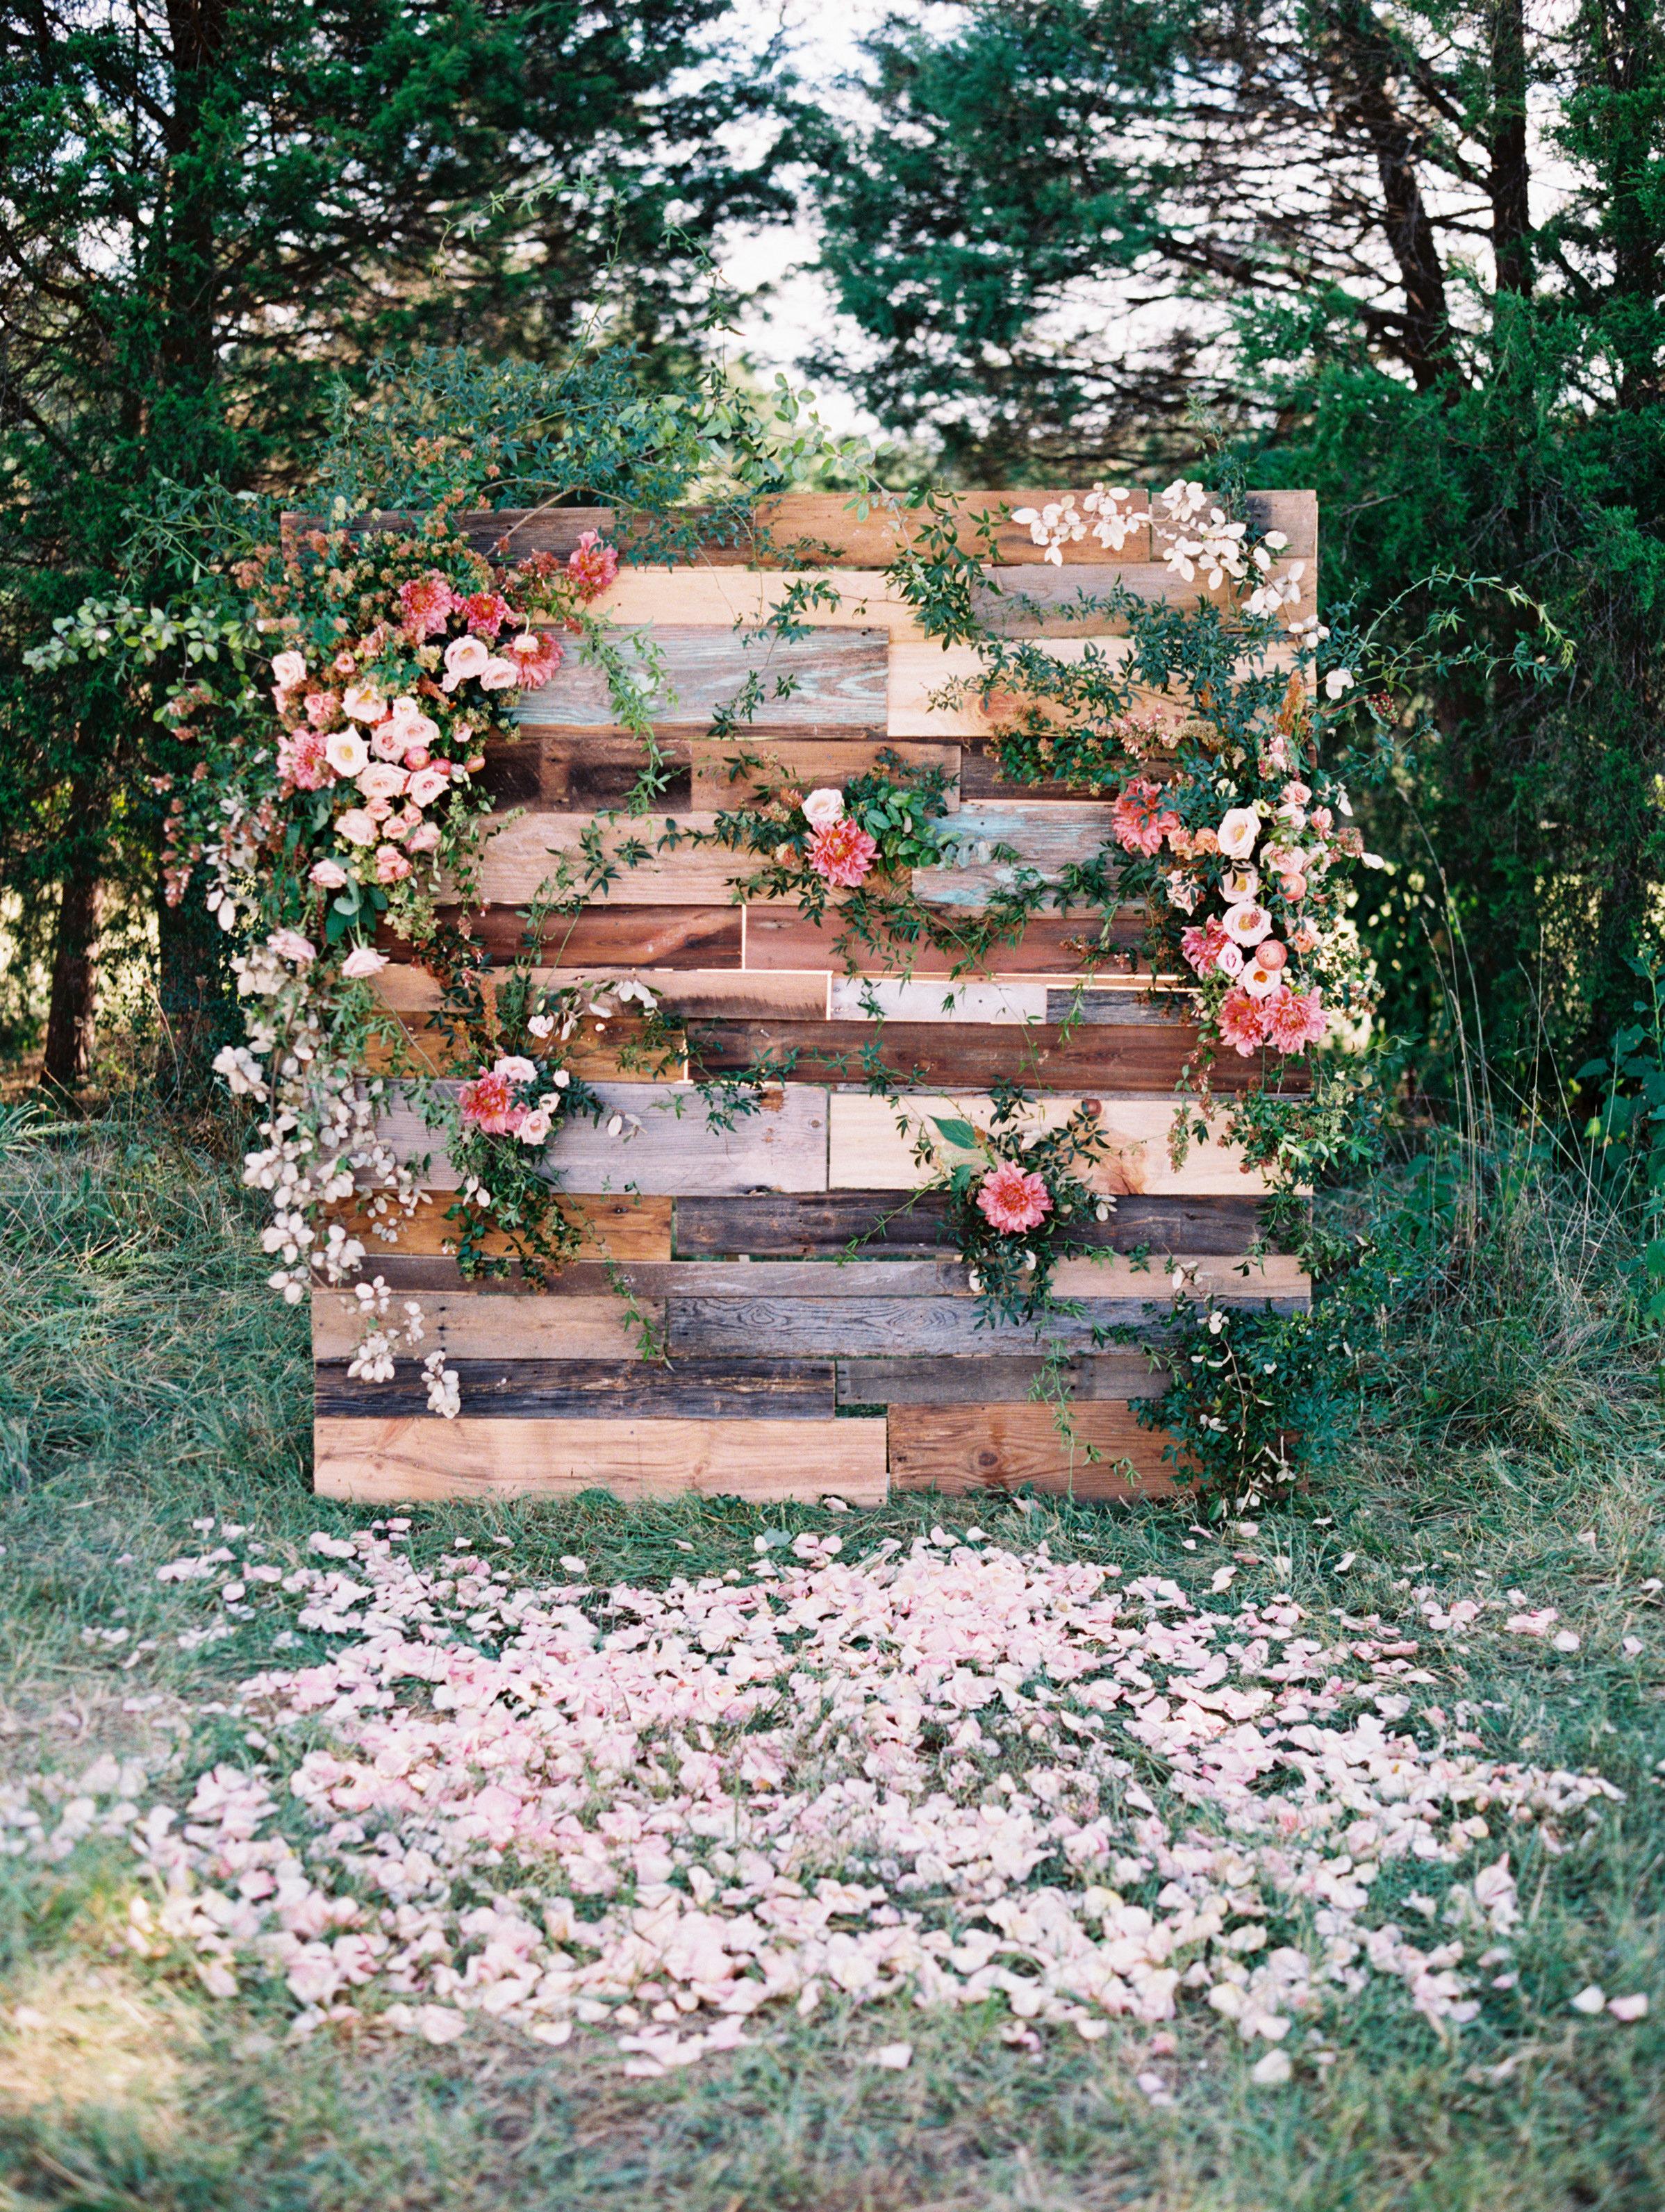 wedding backdrop free standing wood pallet pink blooms greenery